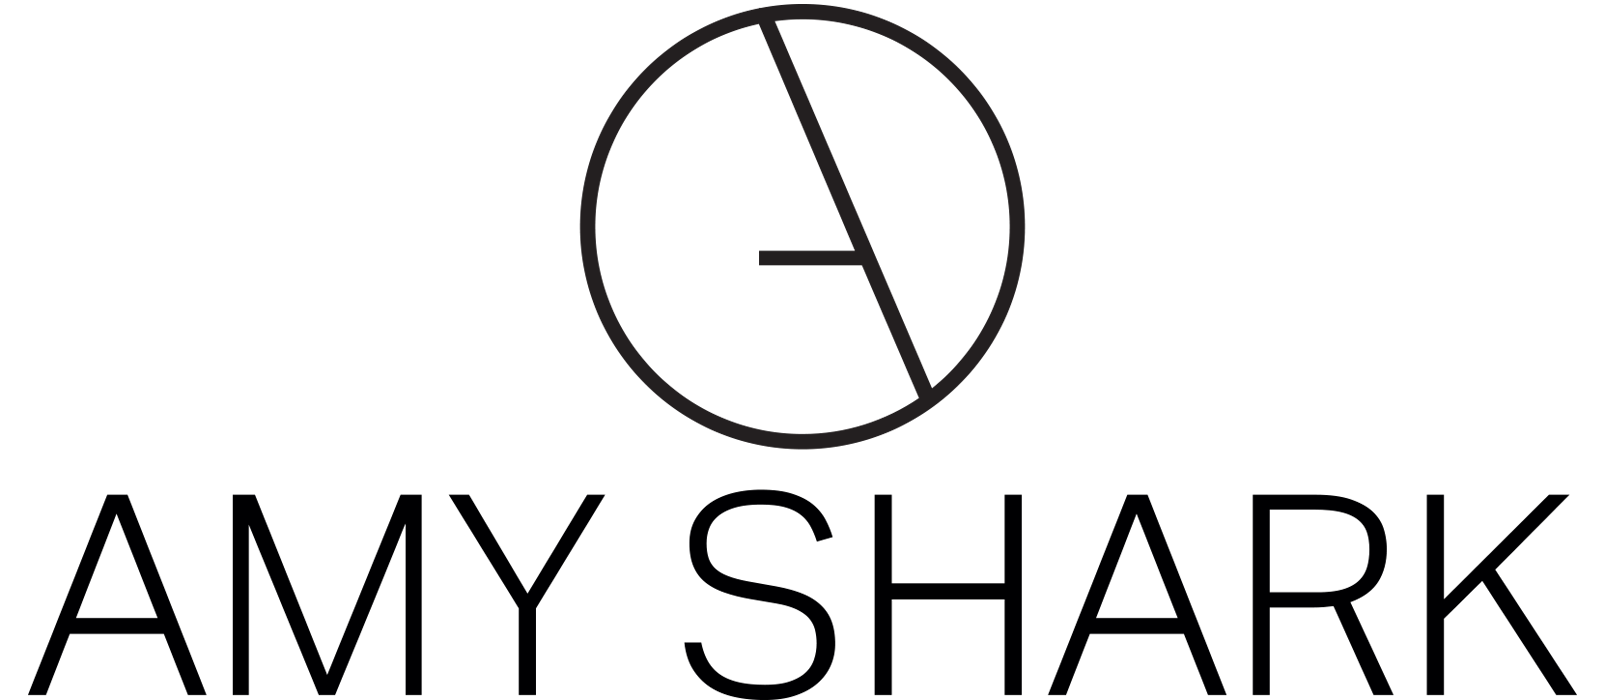 Image Result For Amy Shark Logo Shark Logo Shark Logos